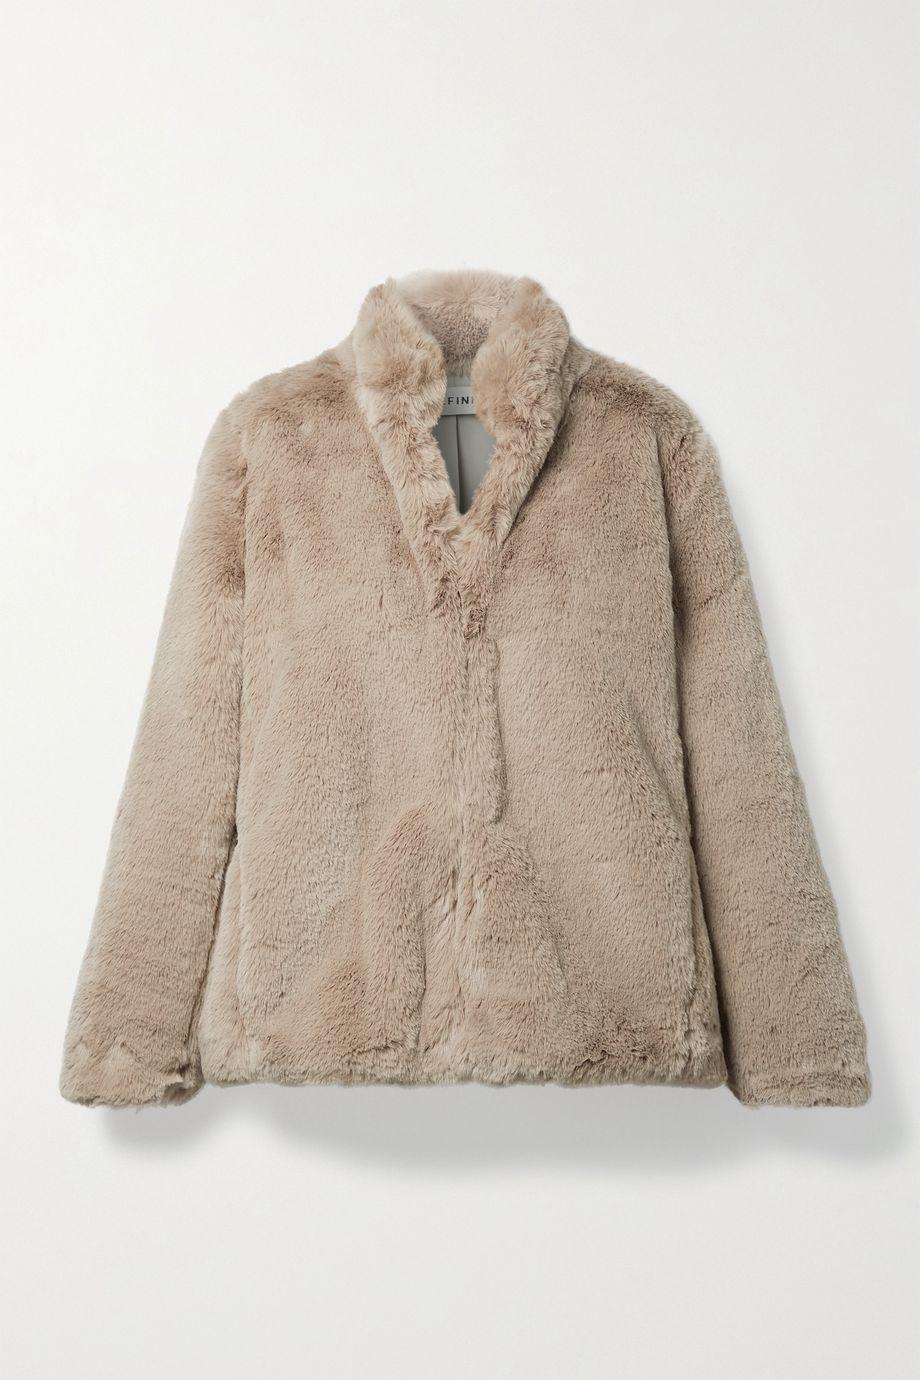 Cefinn Carly faux fur jacket